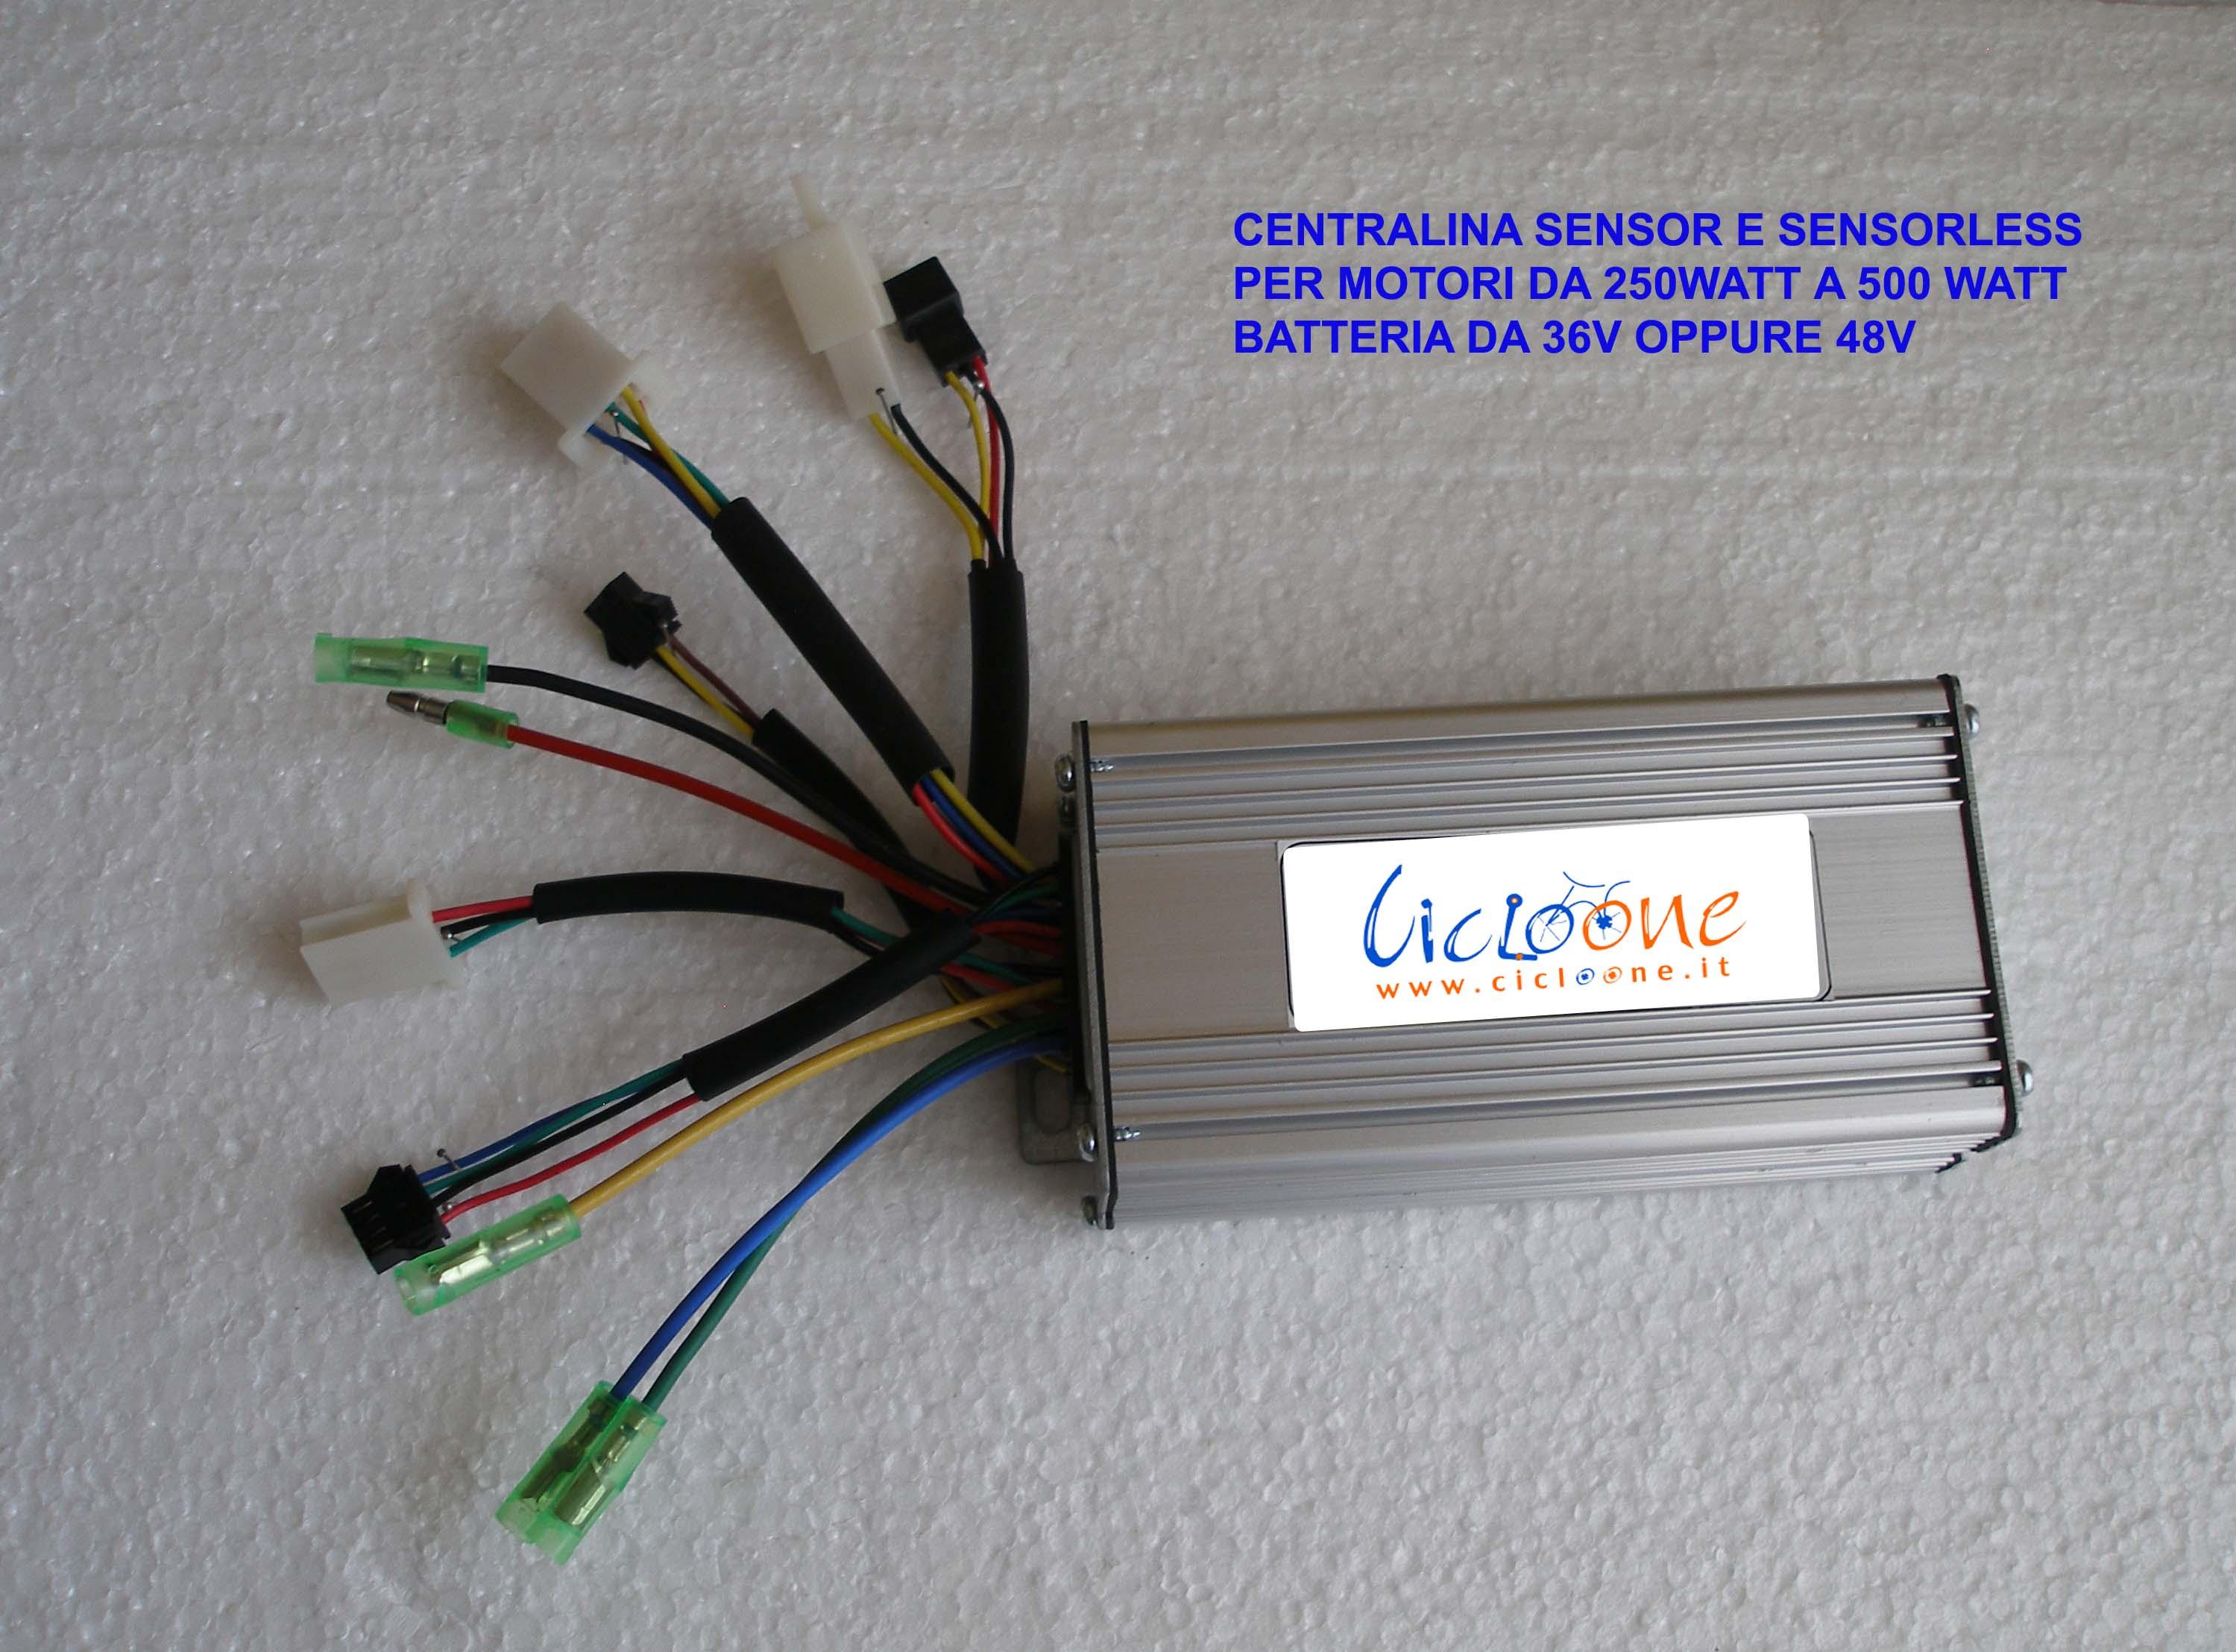 centralina 500 watt sensore e sensorless